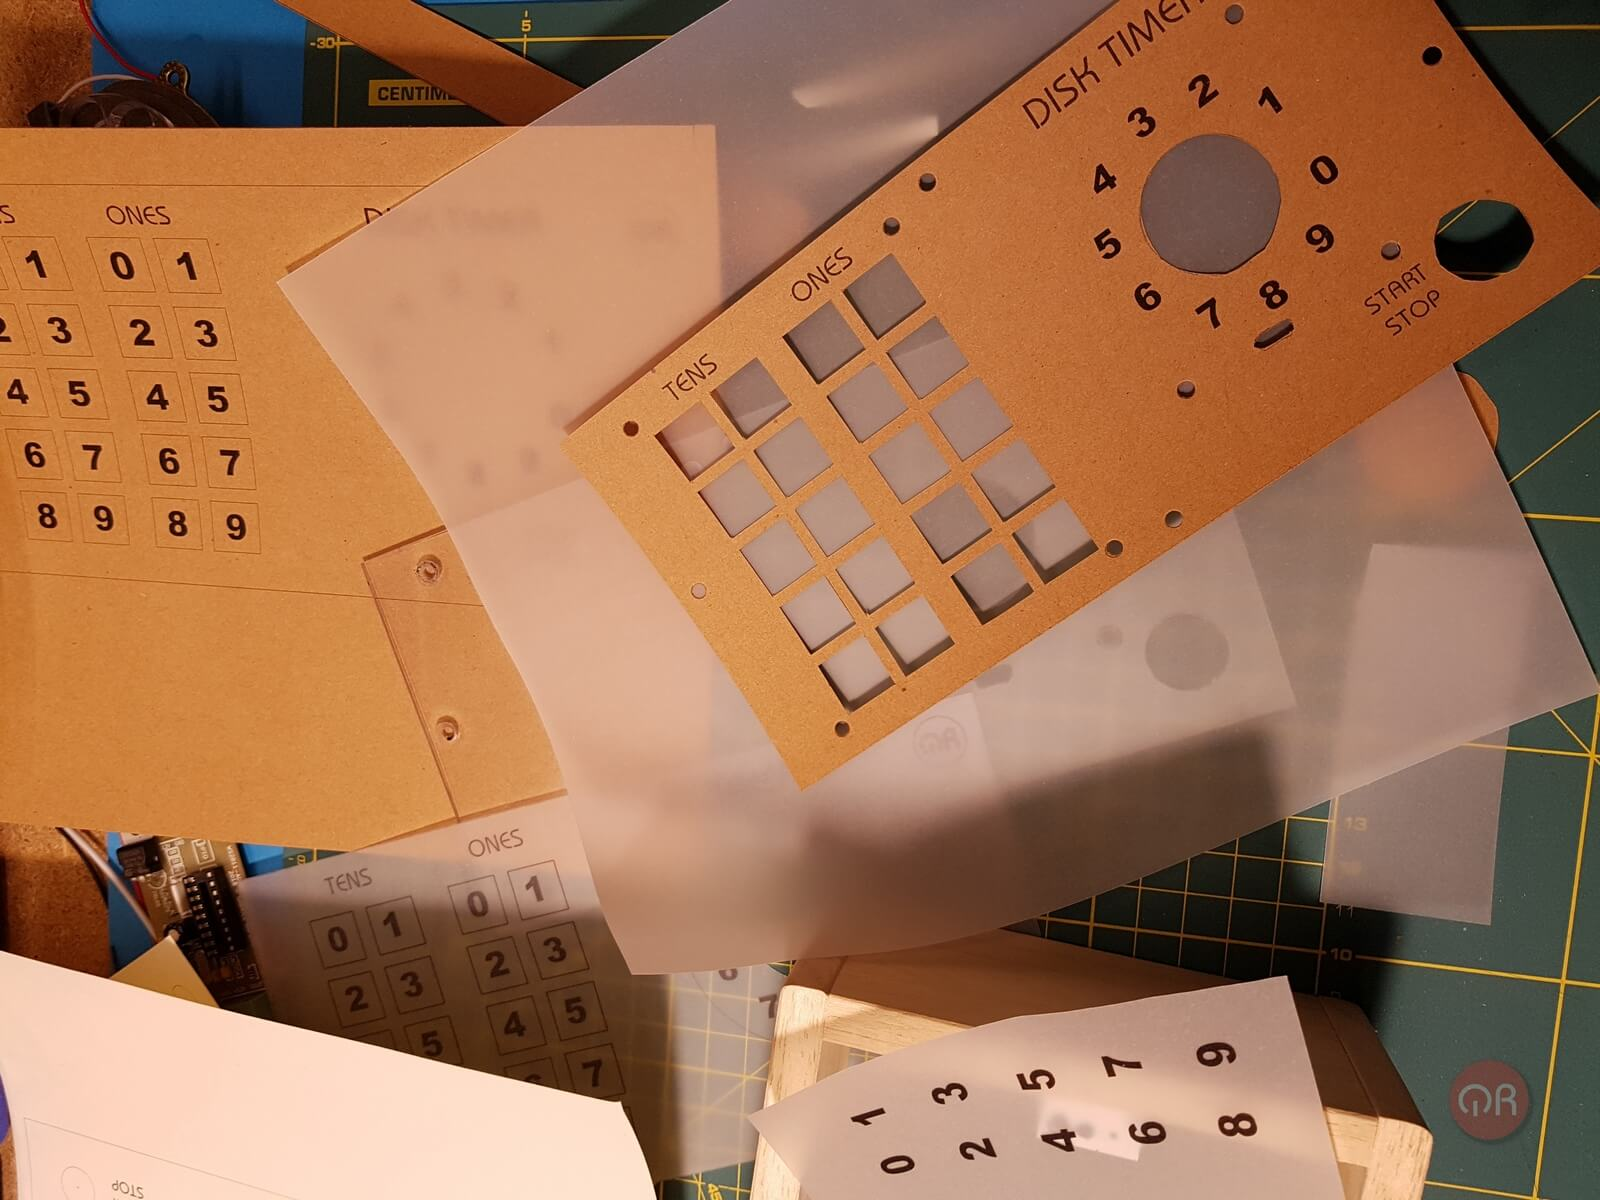 Diseño del panel frontal del timer